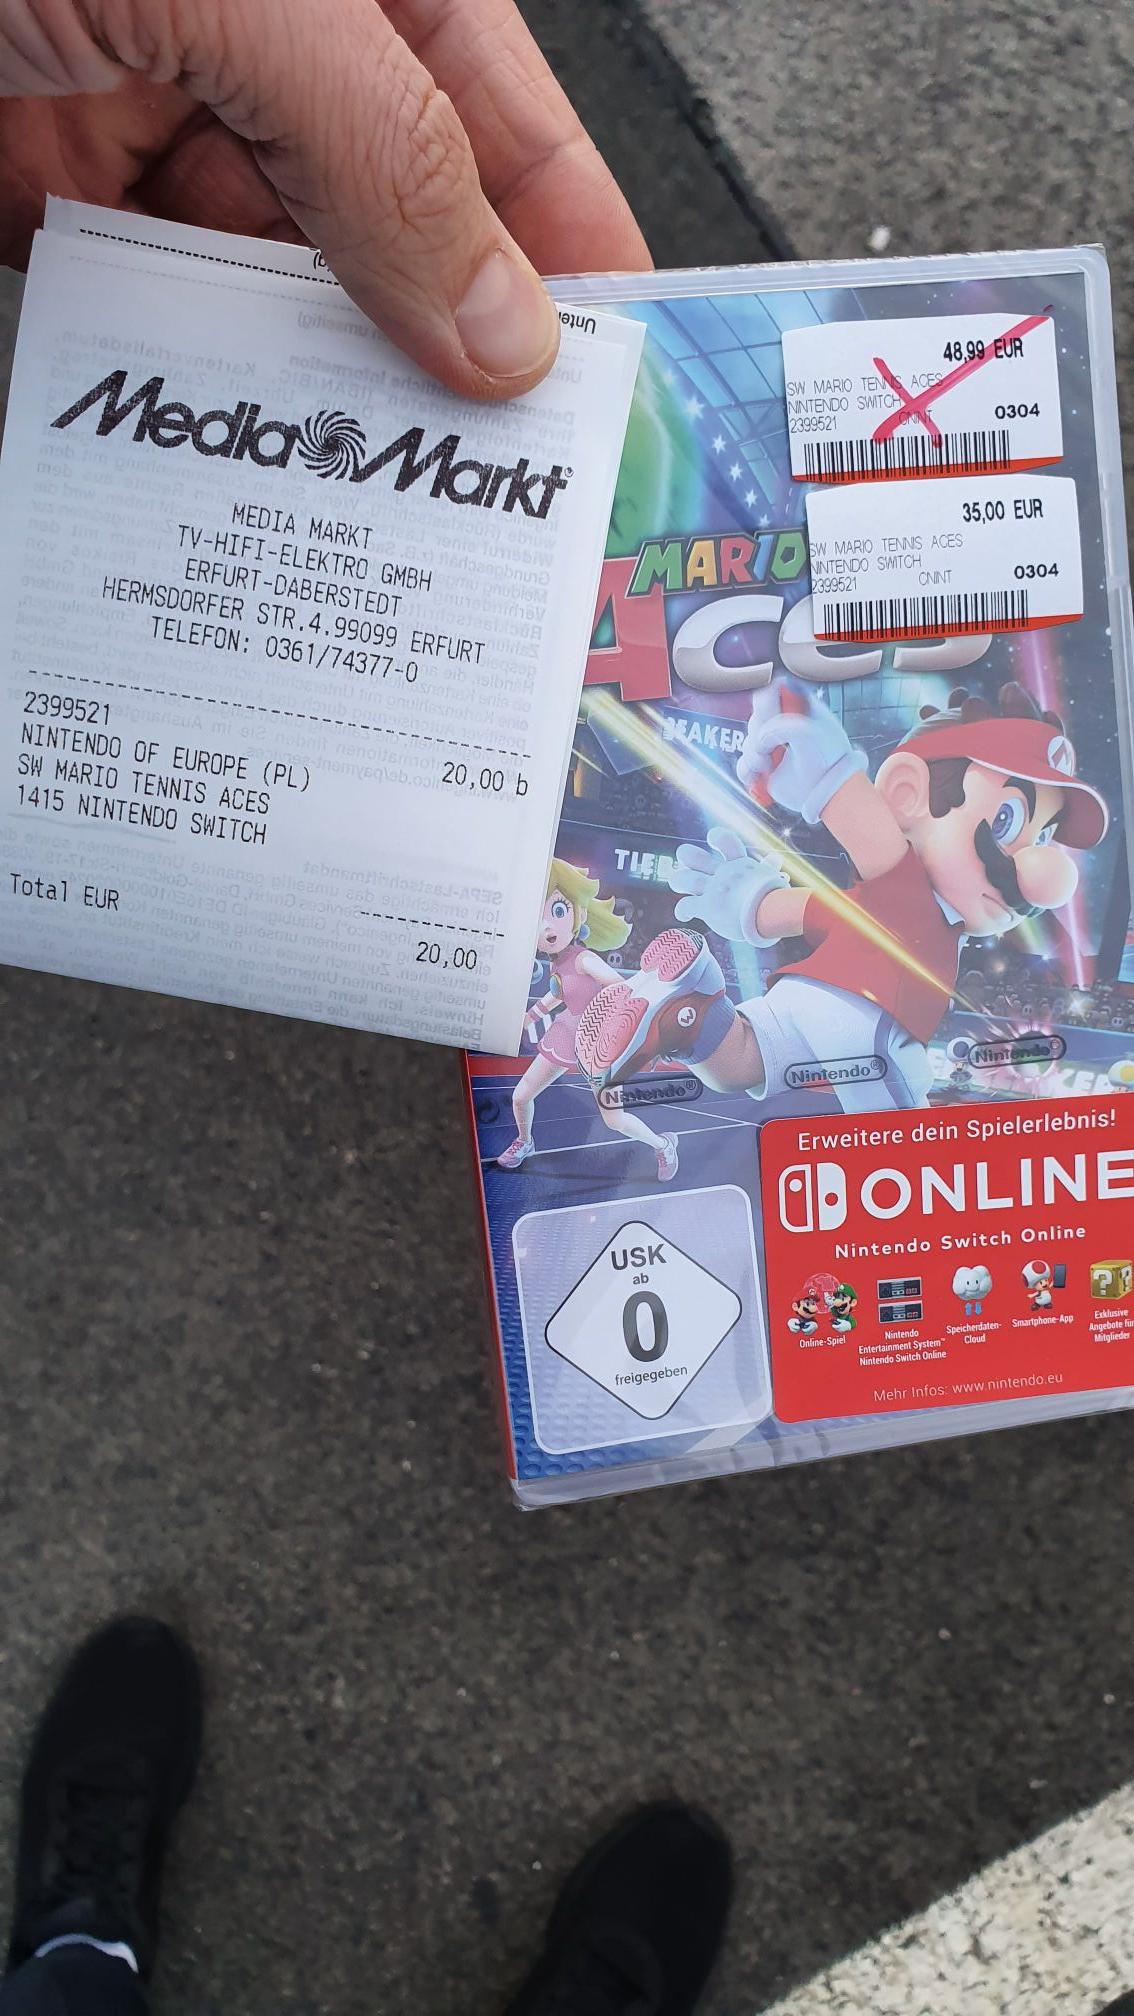 Mario Aces Nintendo Switch (Mediamarkt Erfurt TEC) evtl. Nur Lokal